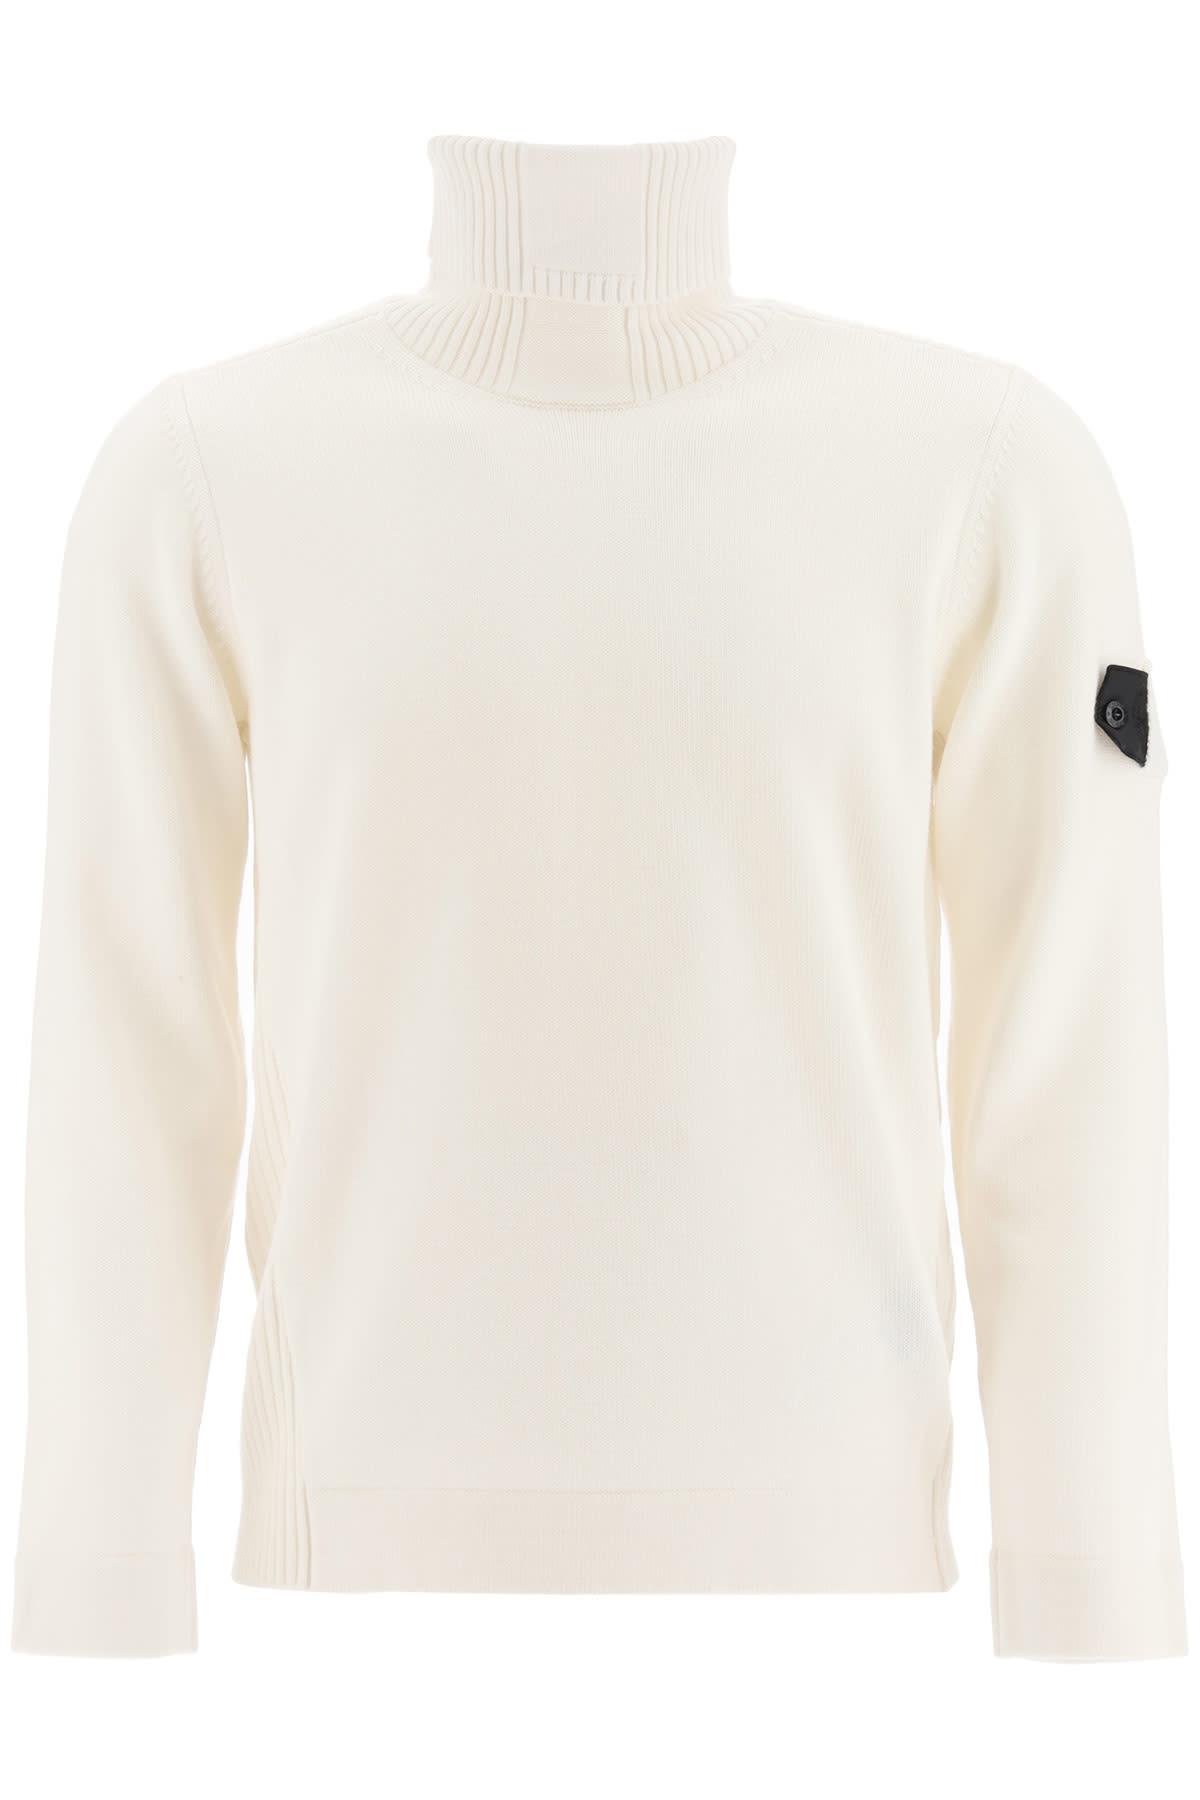 Stone Island Shadow Project Sweaters TURTLENECK SWEATER